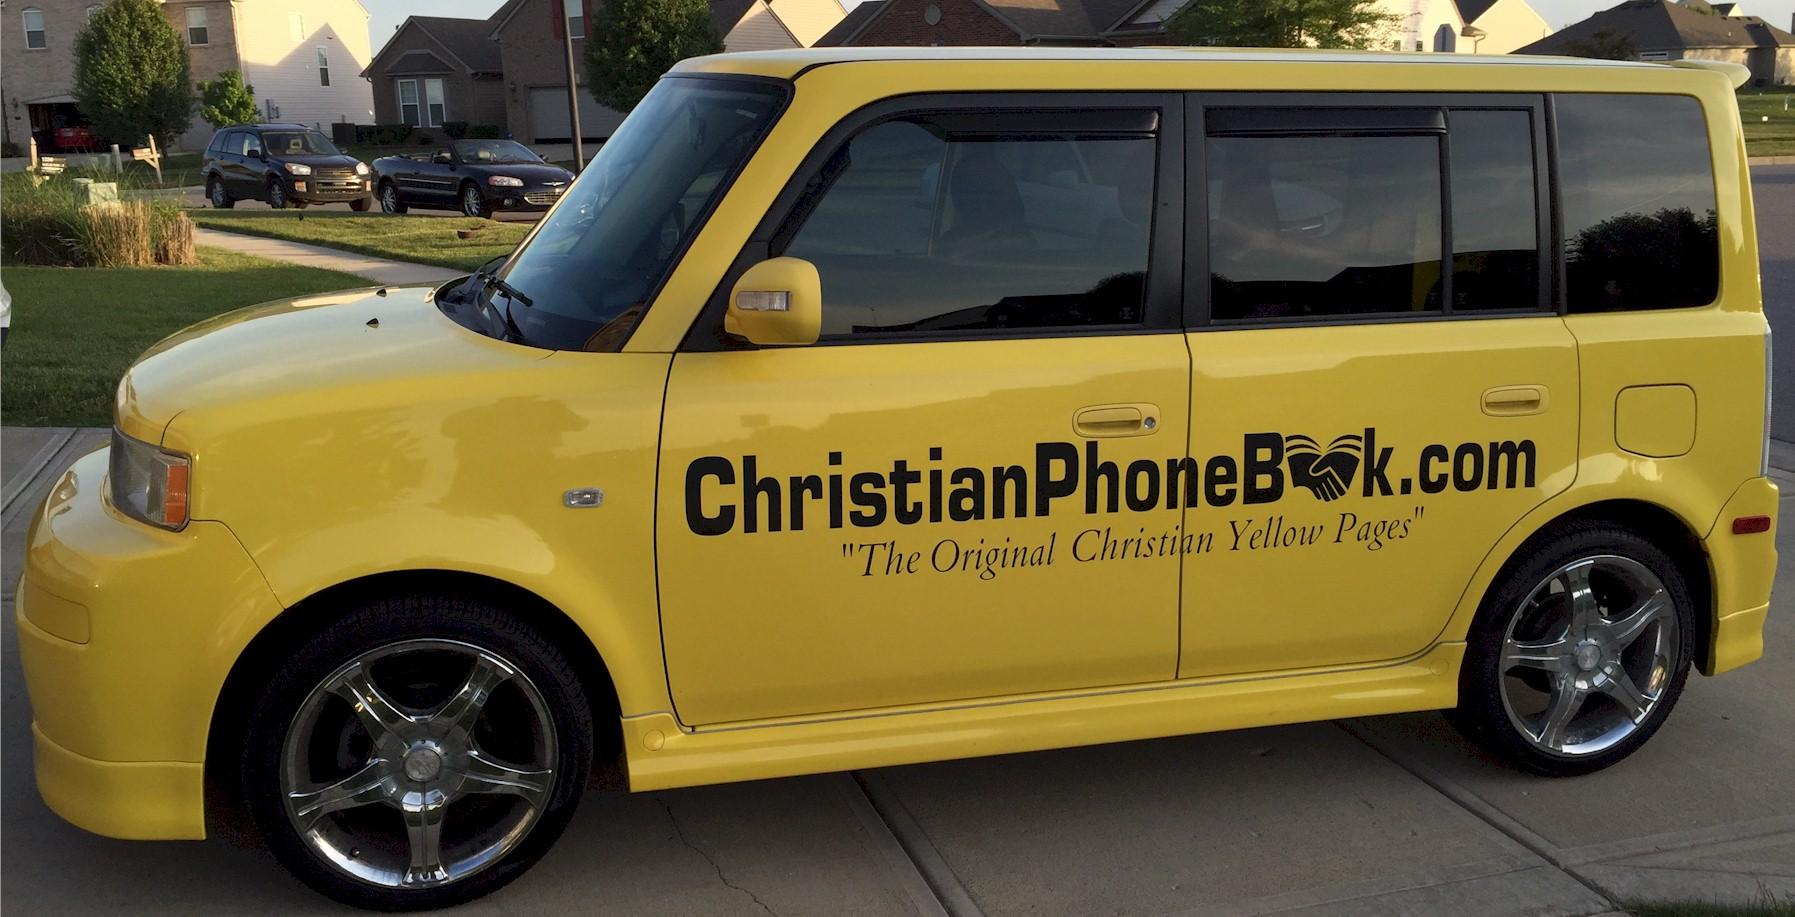 Christian PhoneBook image 1